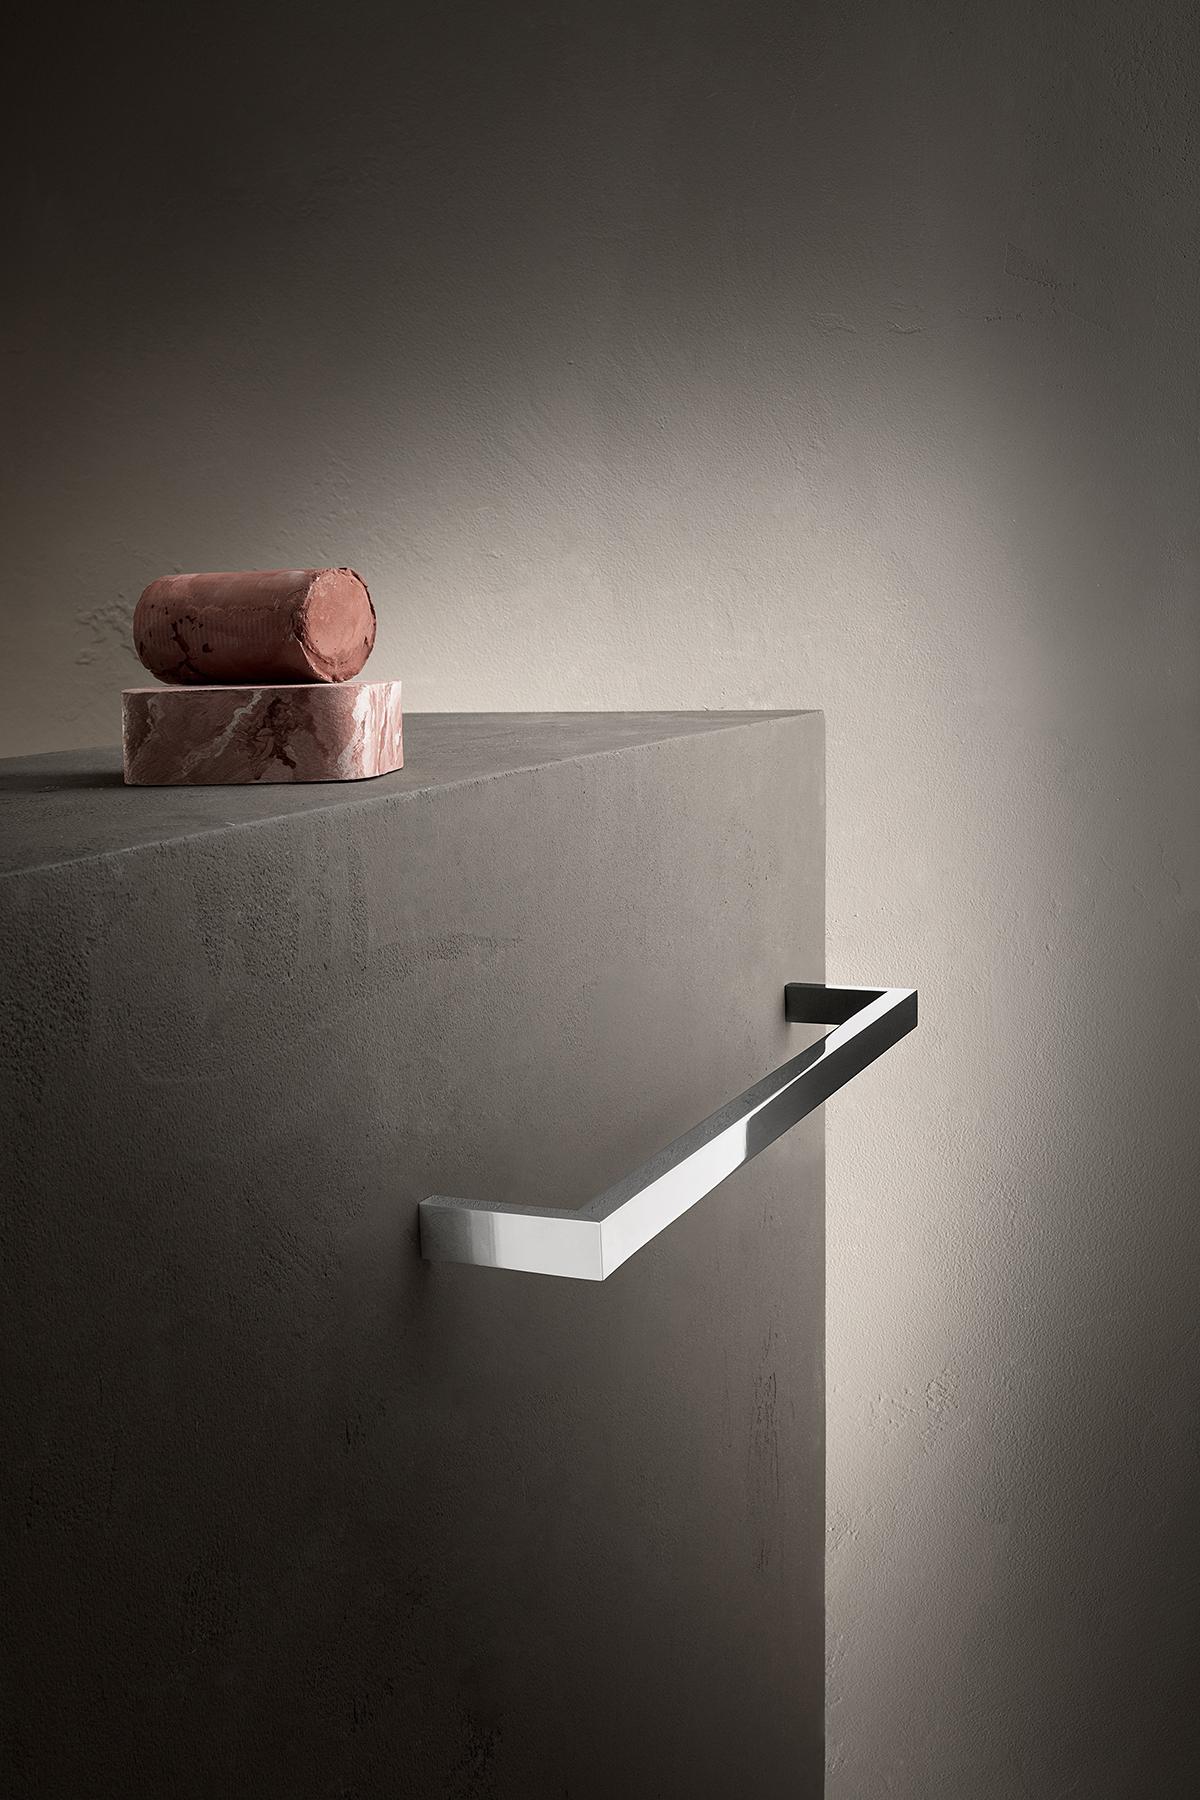 Modern Linea Wall Mount Towel Bar